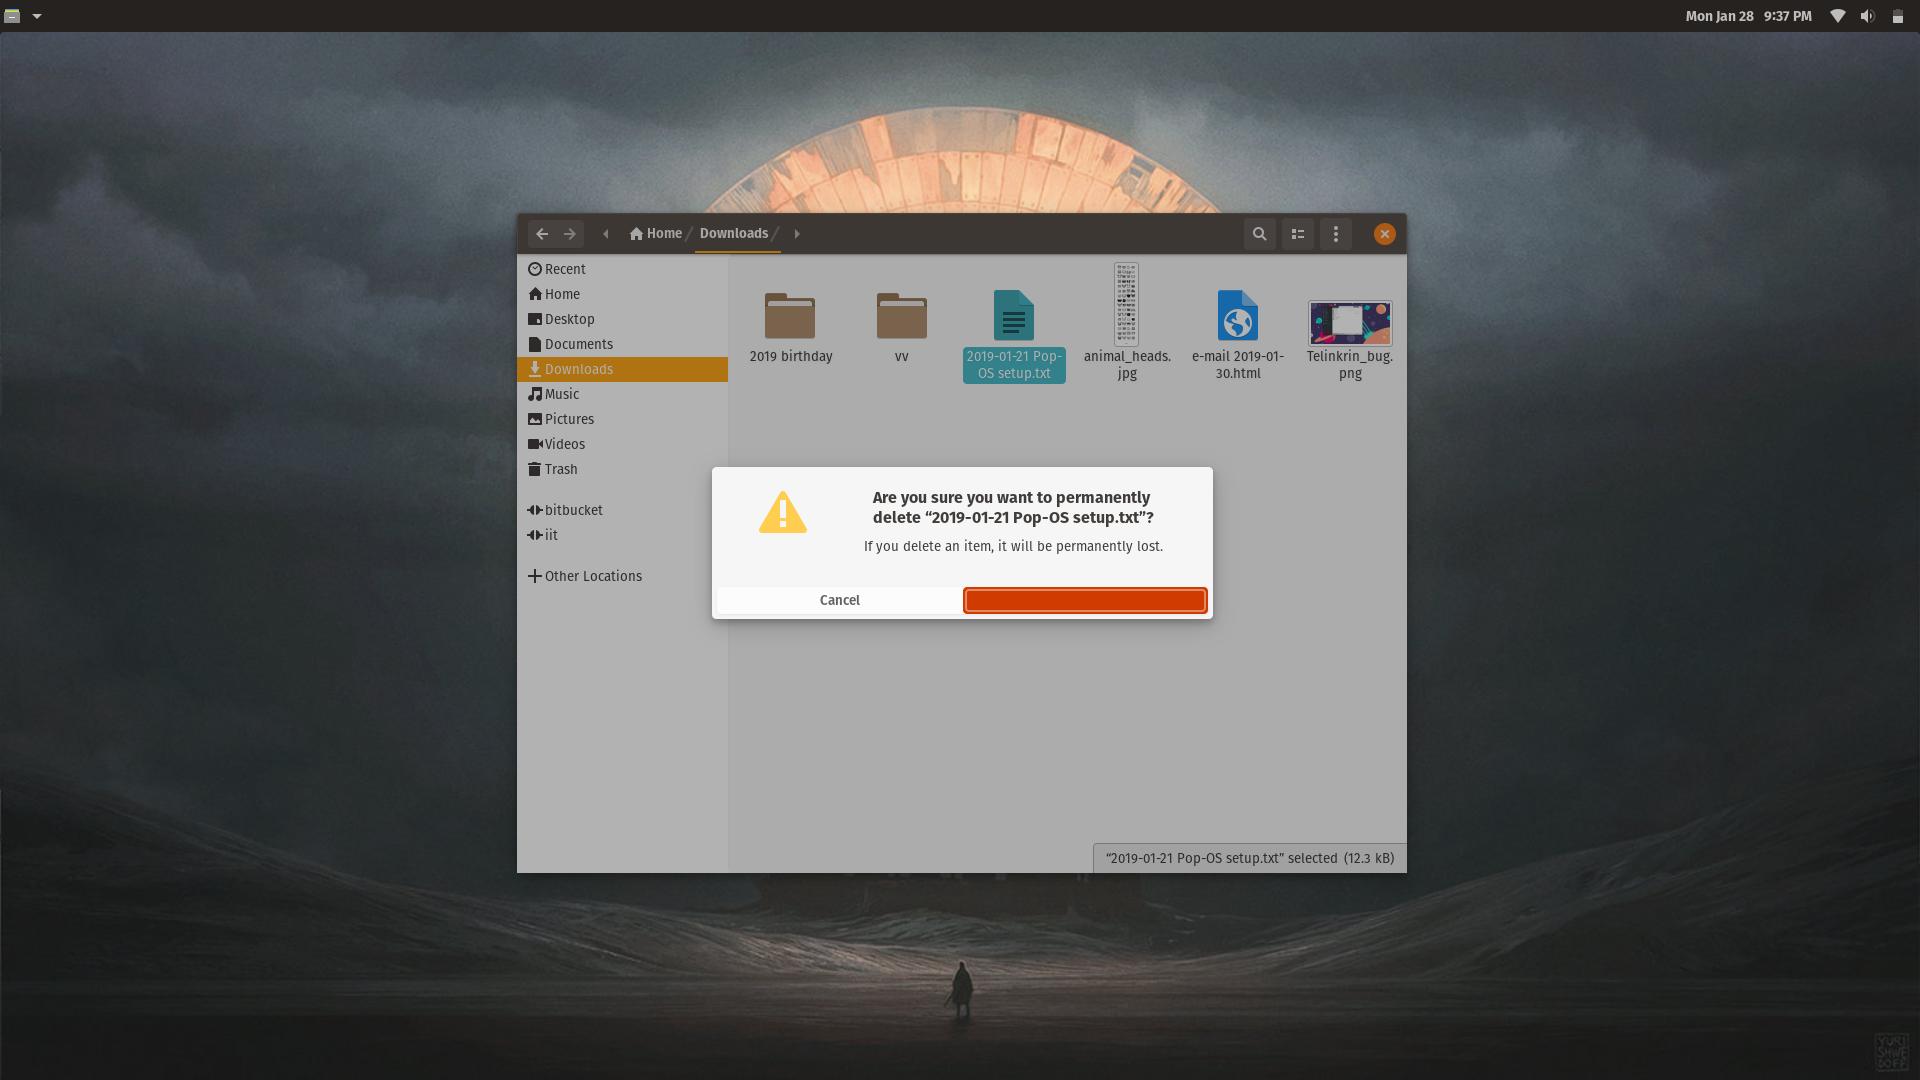 Desktop right-click menu has become completely transparent